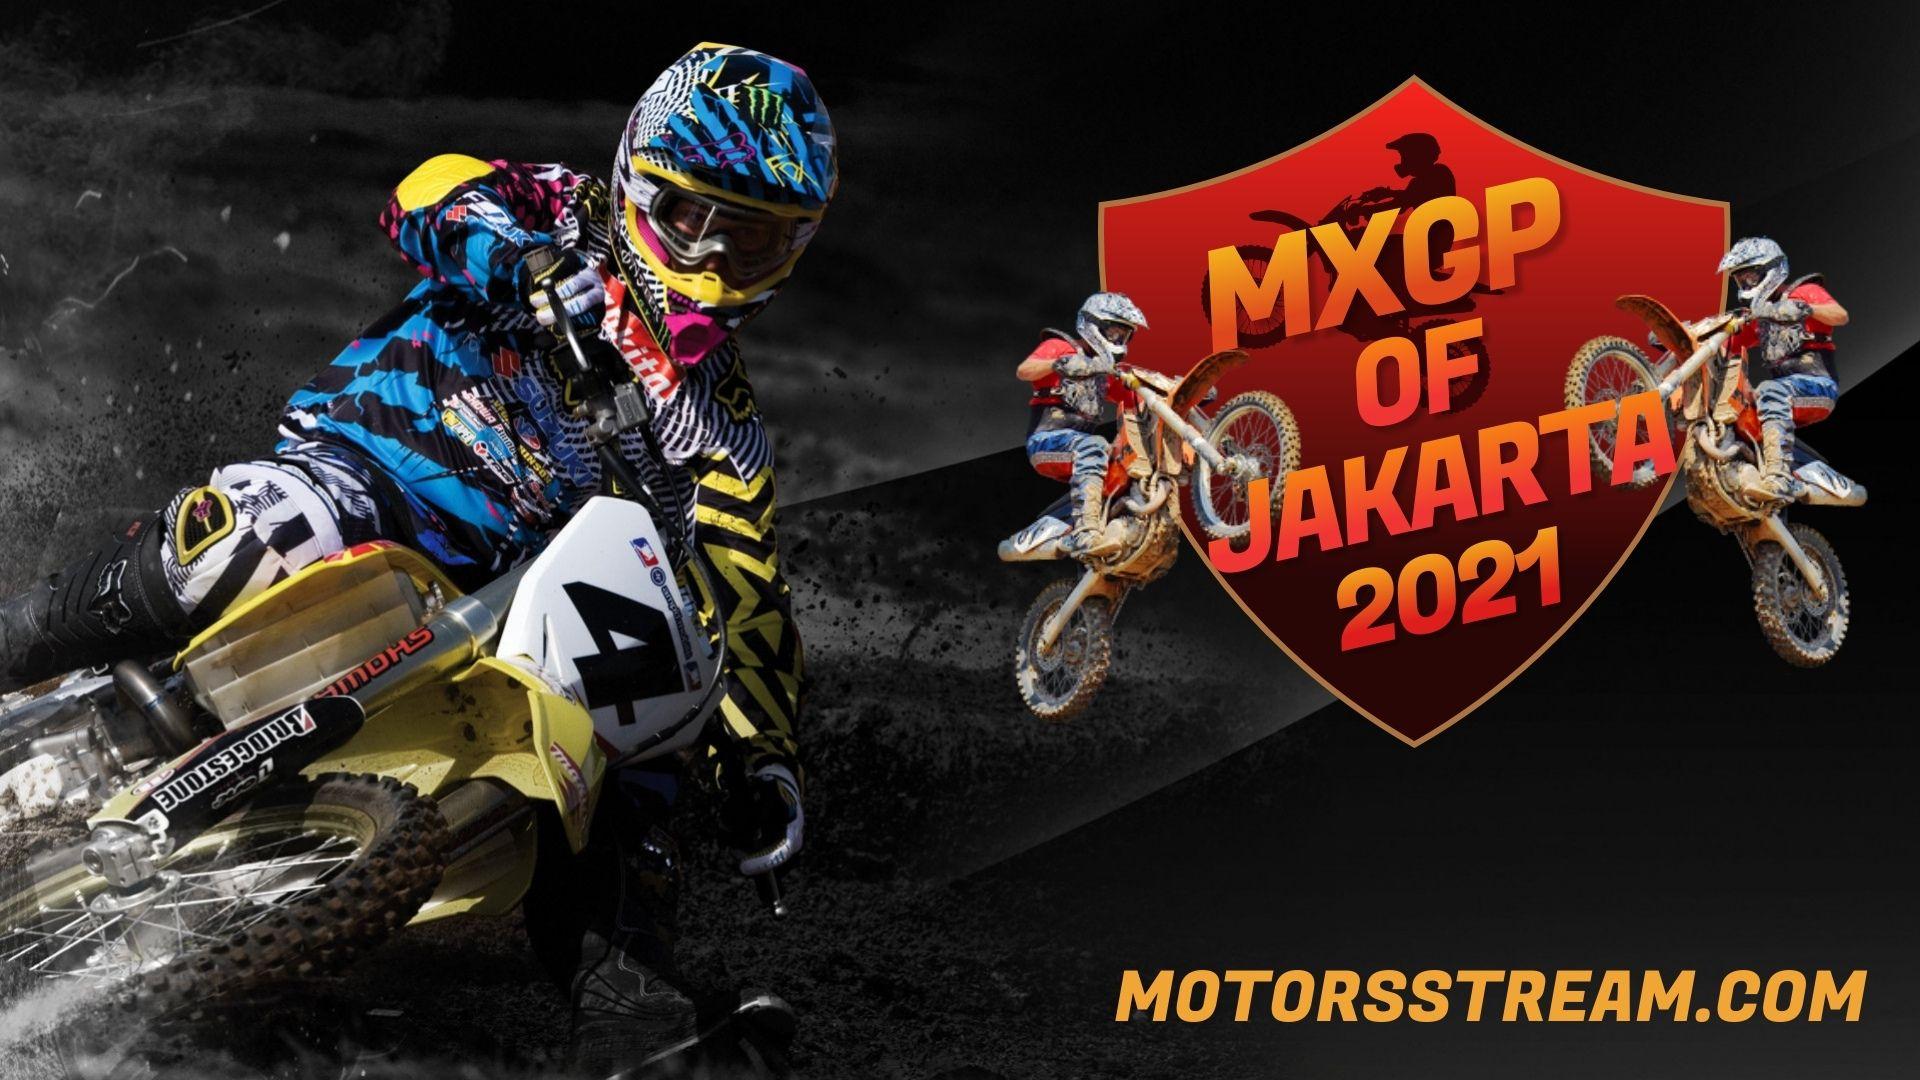 FIM Motocross WC Jakarta Live Stream 2021 | MXGP